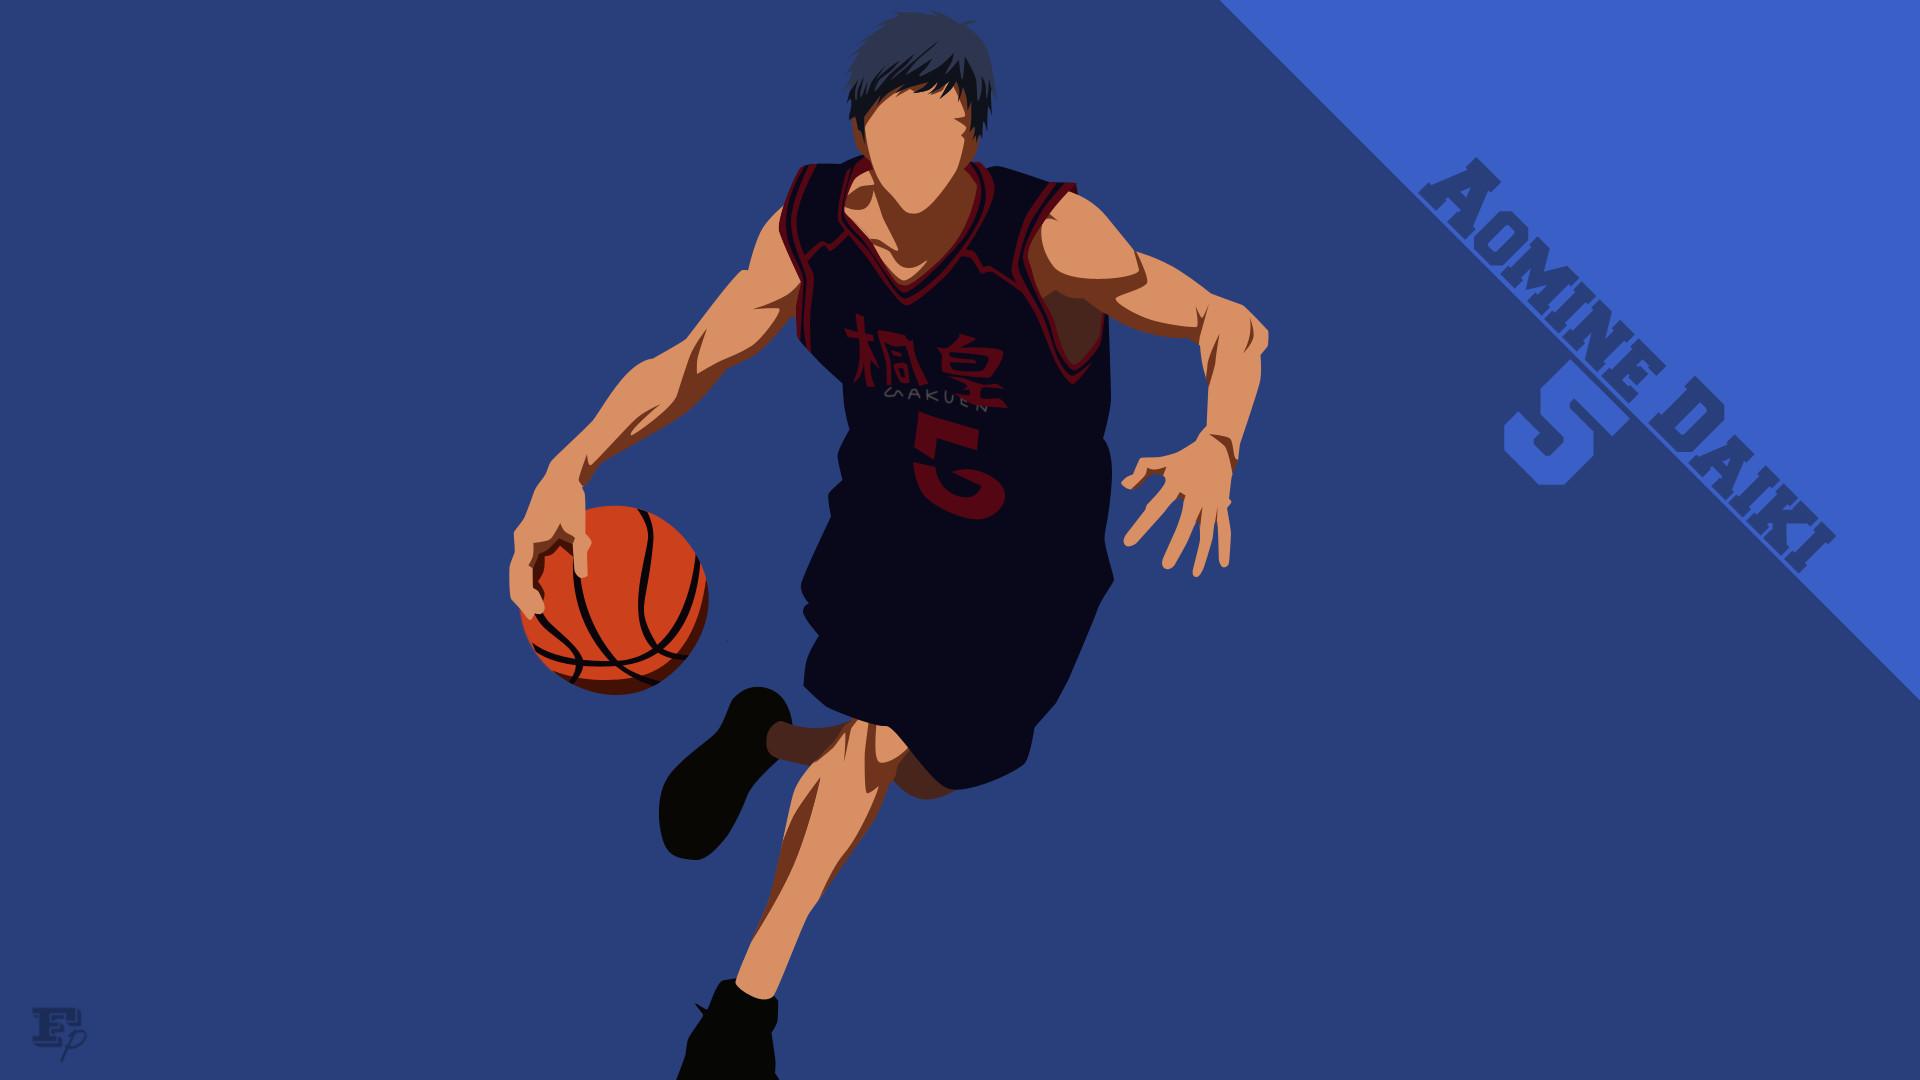 Res: 1920x1080, Anime - Kuroko's Basketball Daiki Aomine Wallpaper